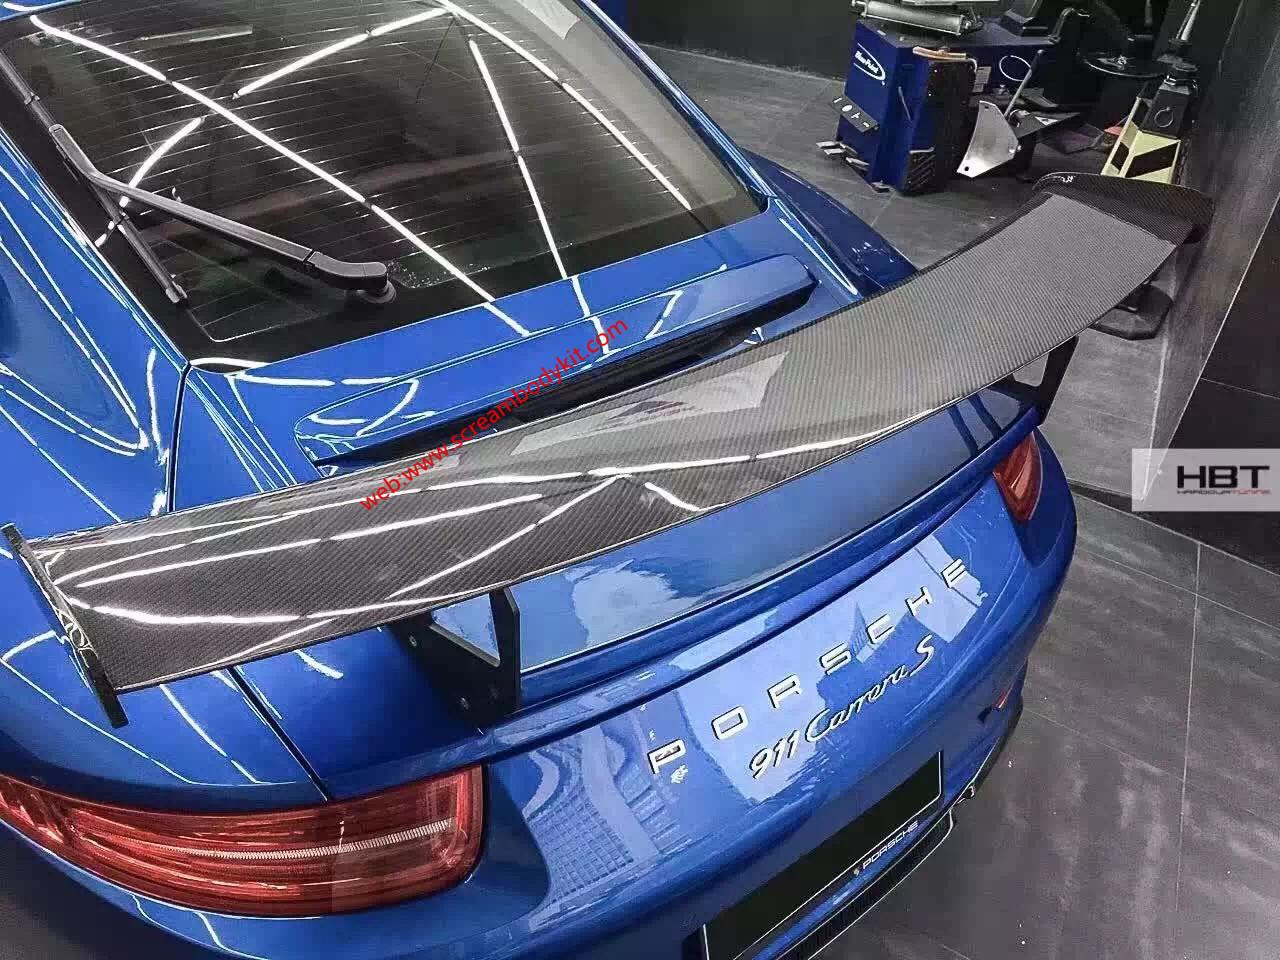 porsche 911 991 body kit front lip rear lip side skirts wing carbon fiber